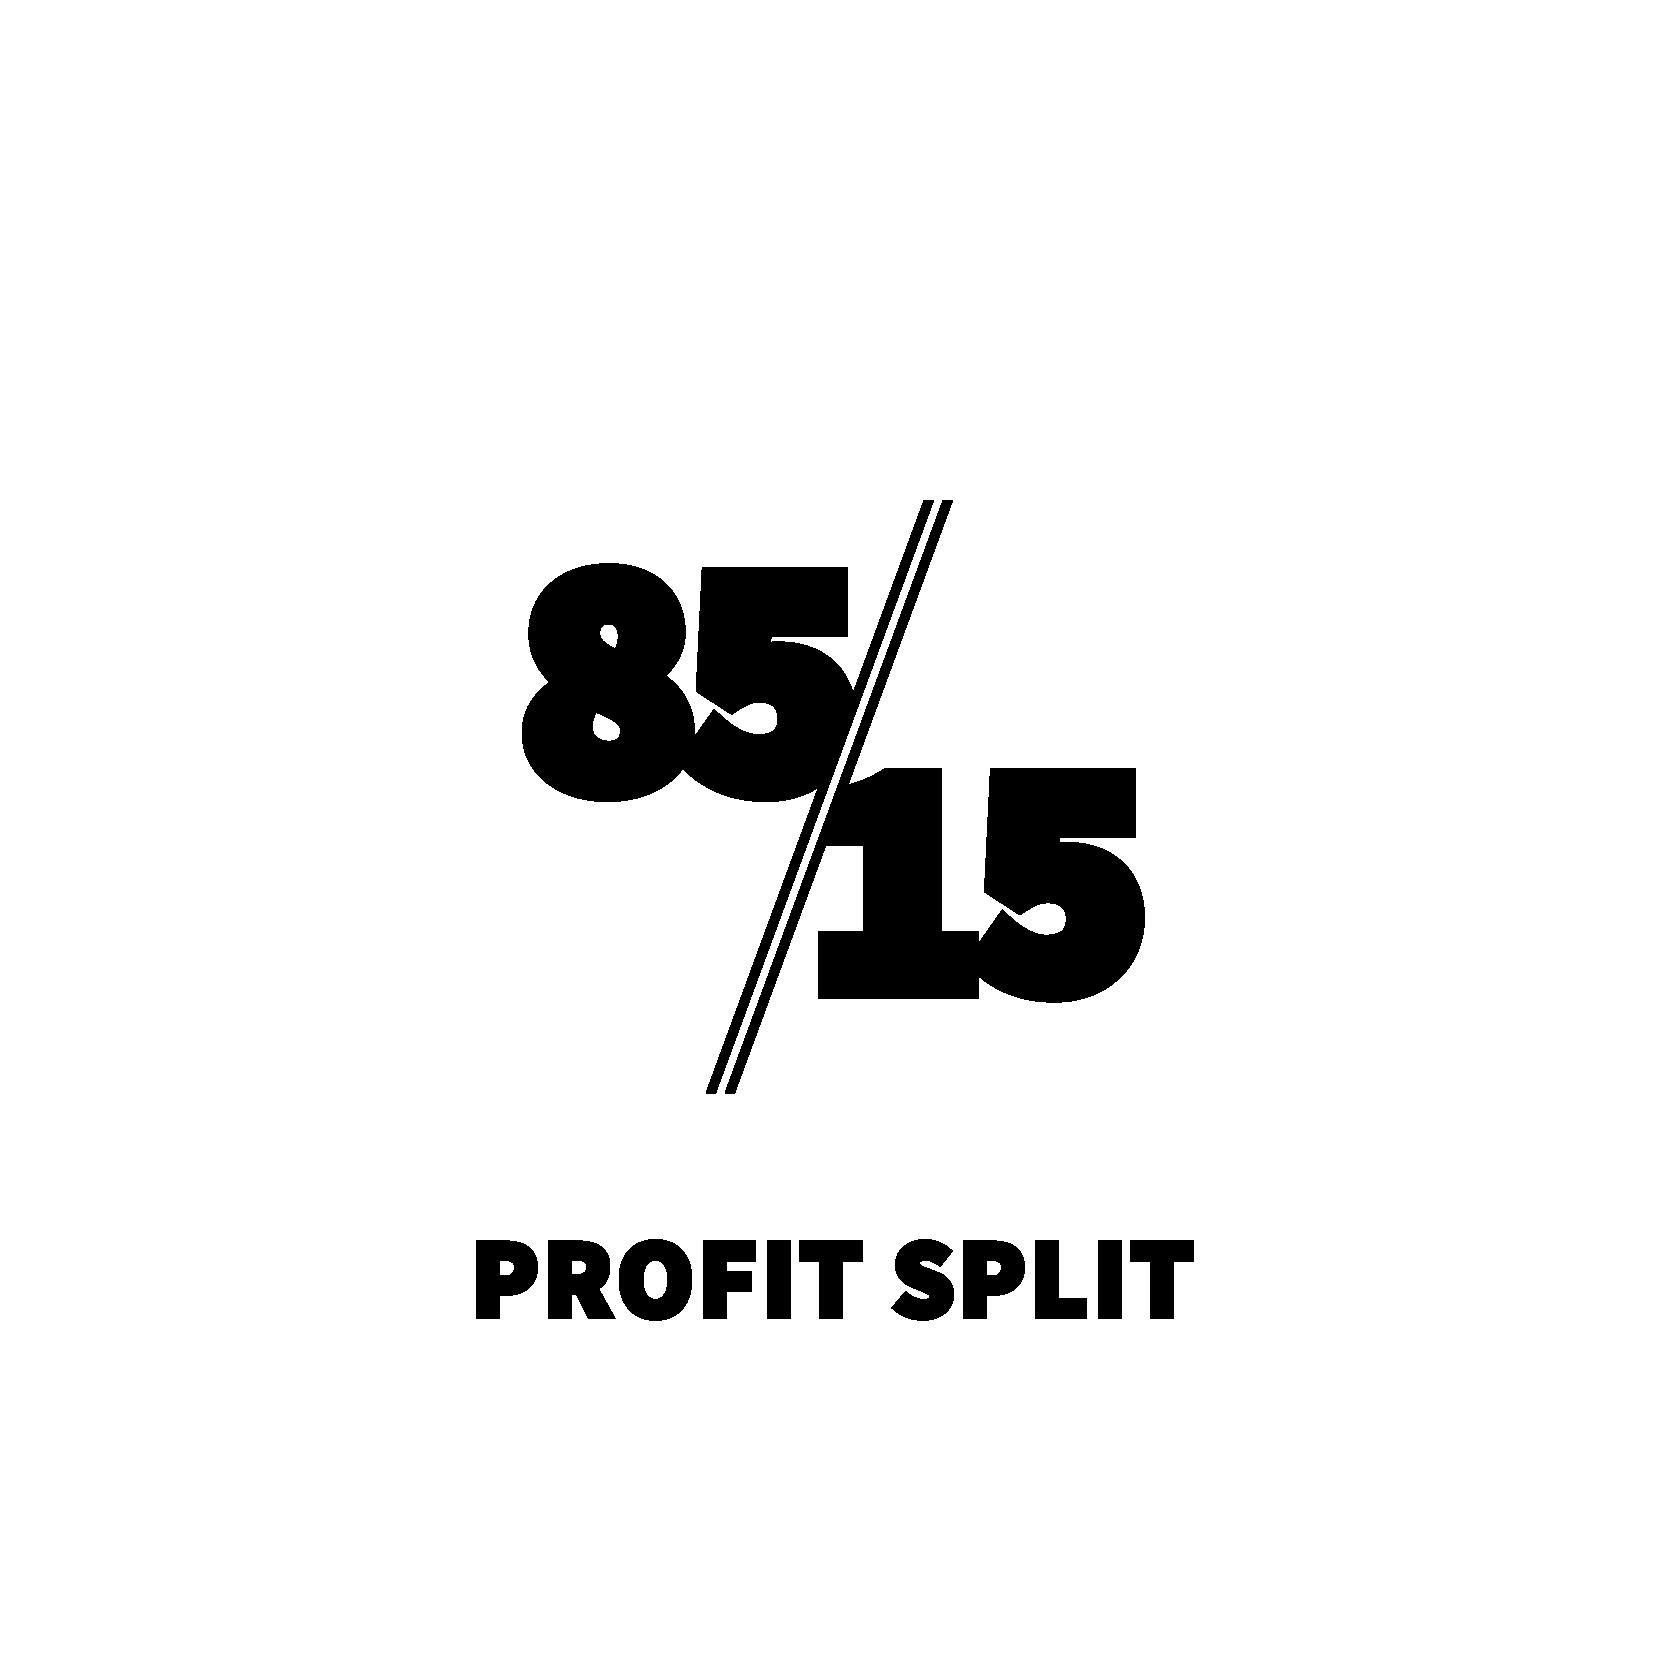 profitsplit-01.png